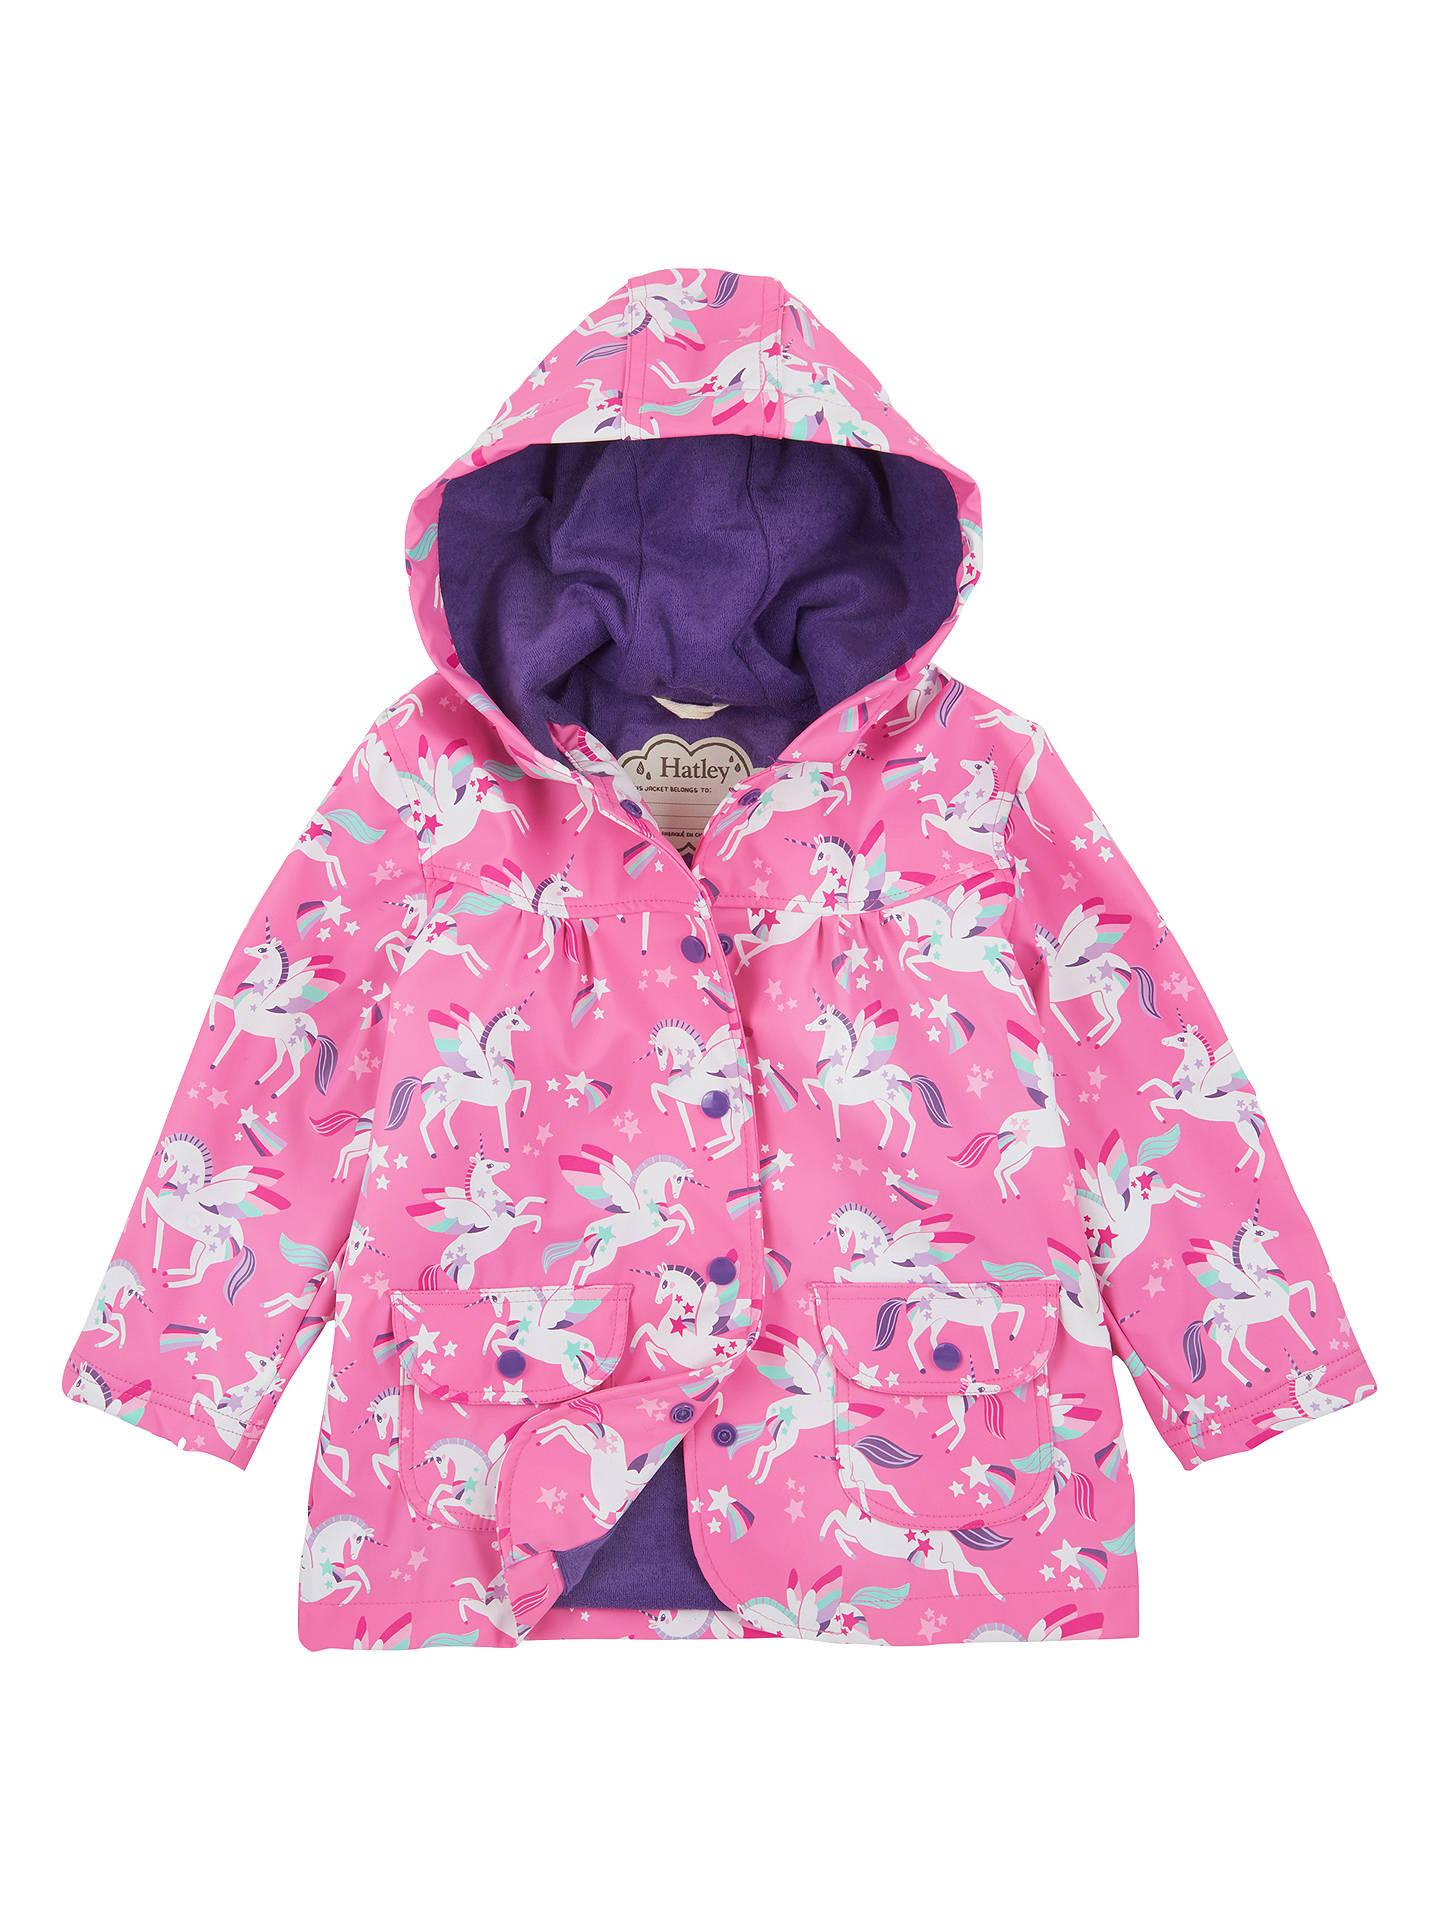 06ad3ce336ed Hatley Girls  Unicorn Print Raincoat